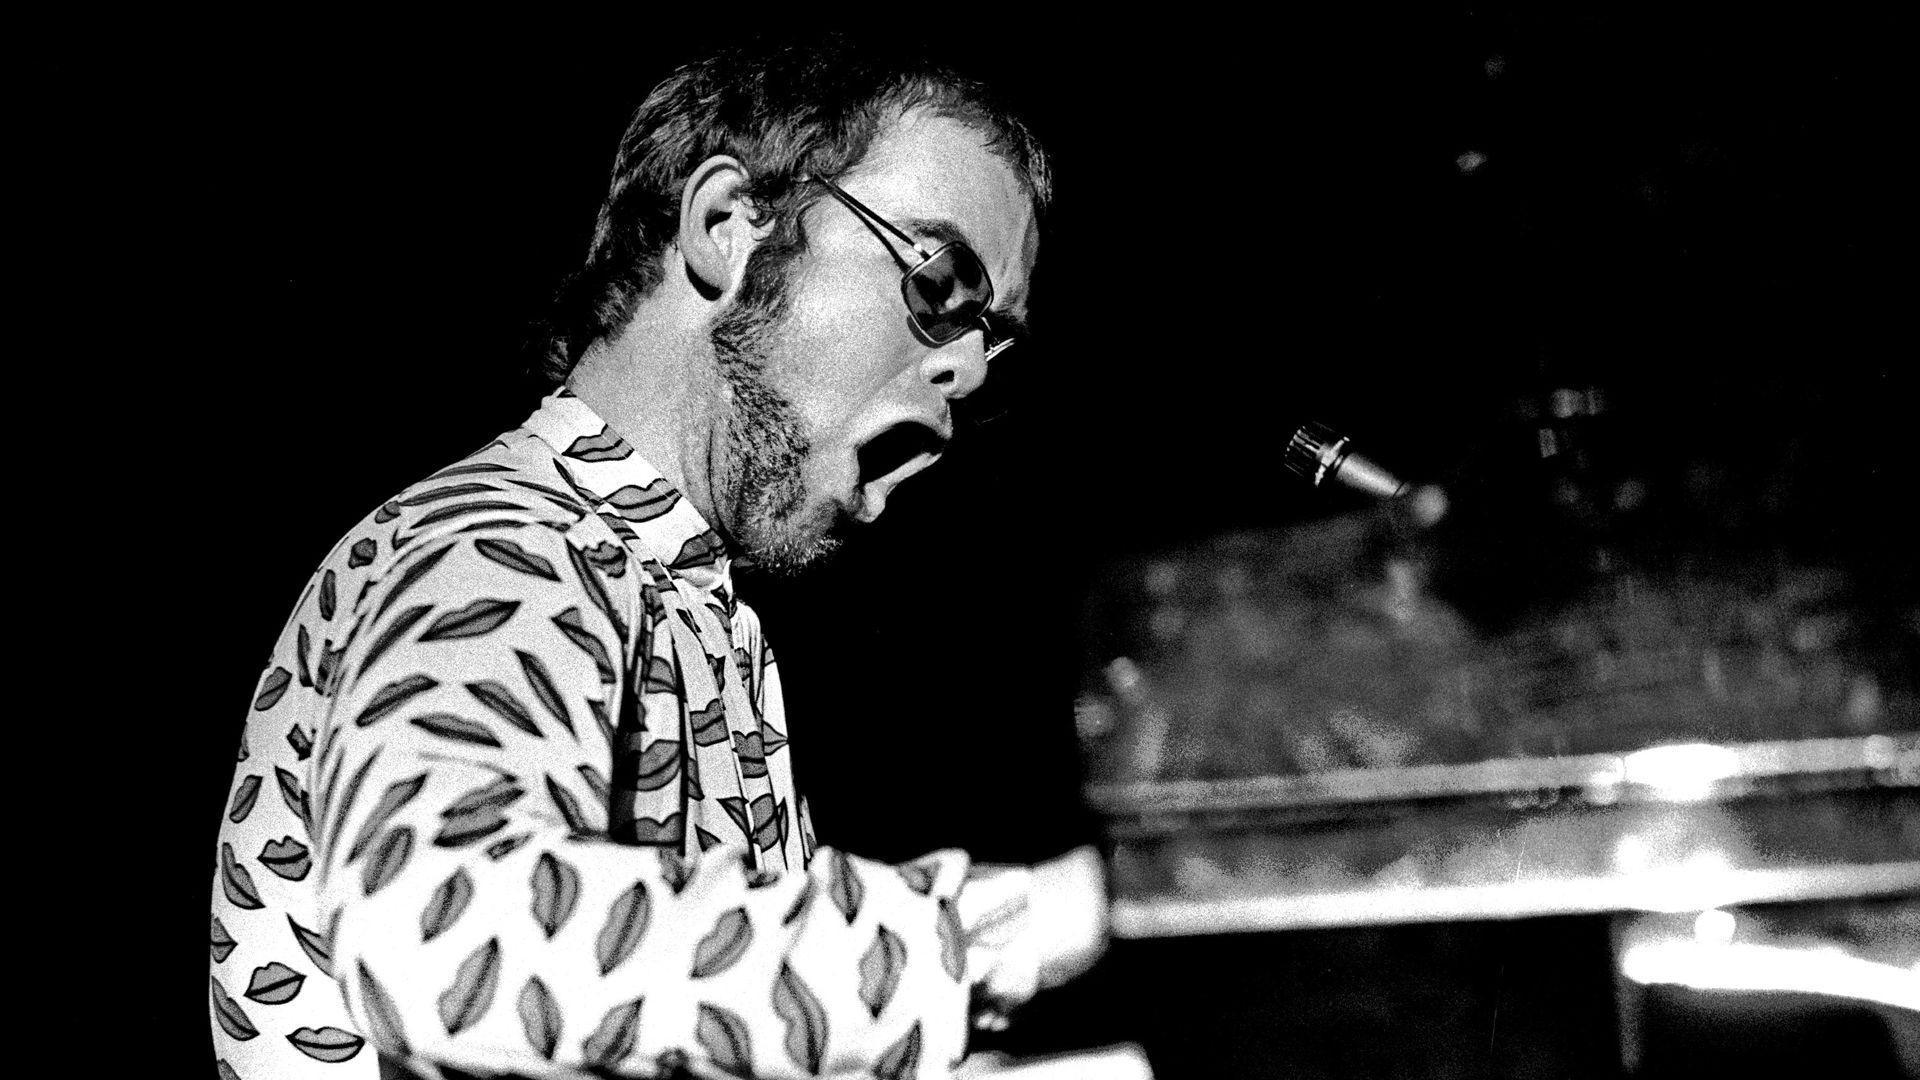 Elton John Wallpapers Top Free Elton John Backgrounds Wallpaperaccess